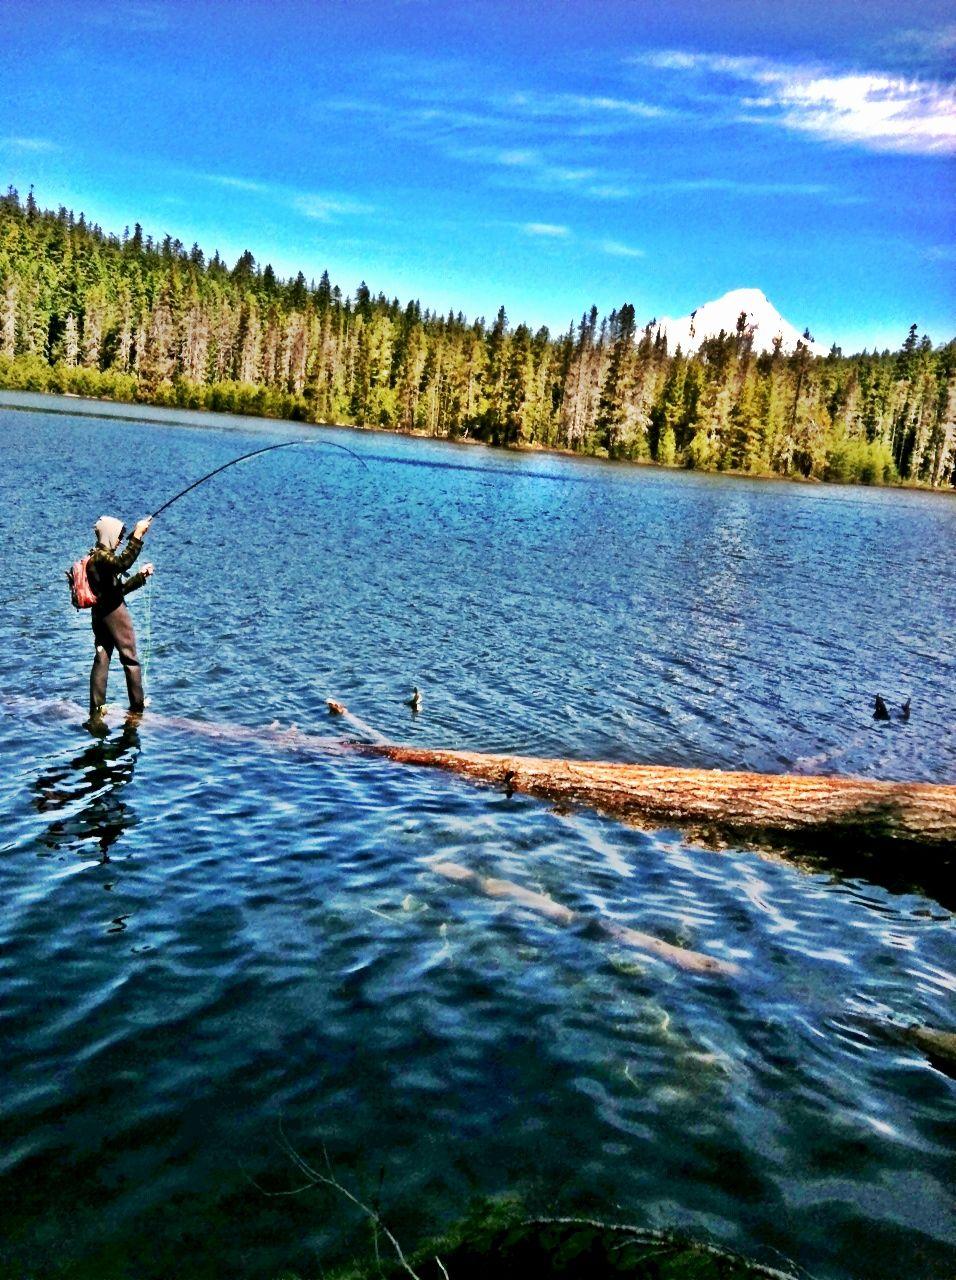 Fly Fishing At Frog Lake In Oregon Oregon Travel Fly Fishing Fish Camp